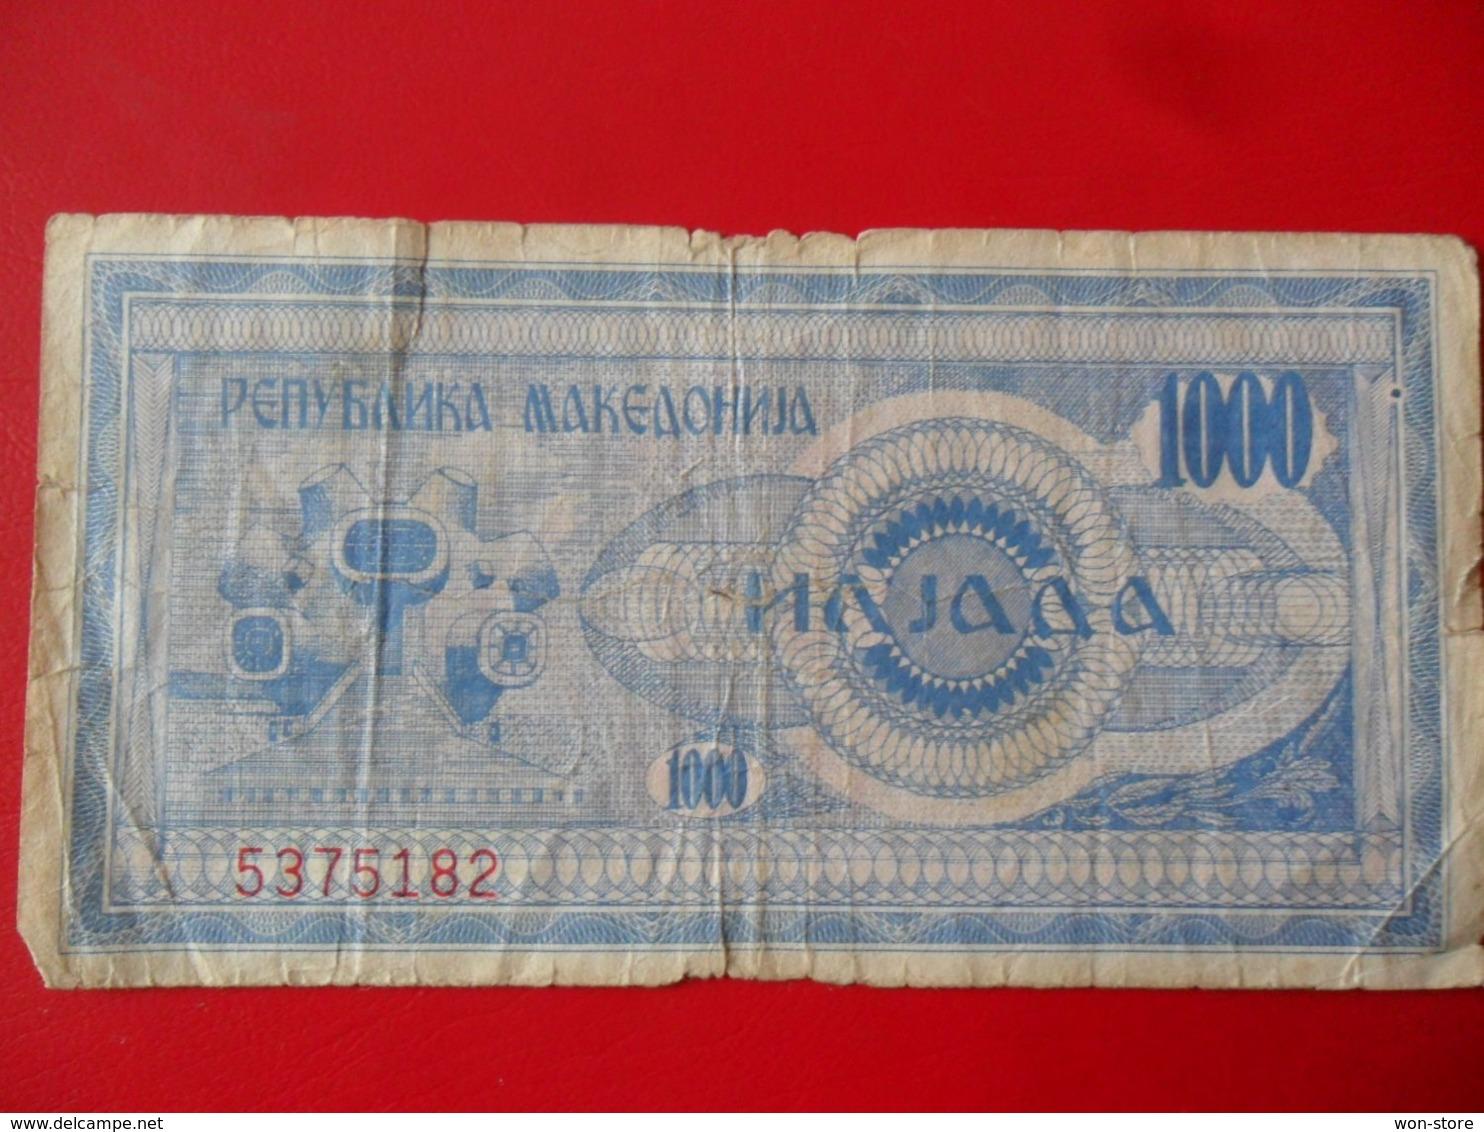 North Macedonia-Severna Makedonija 1000 Denari 1992, P-6a - - - 1950 - - - - Macedonia